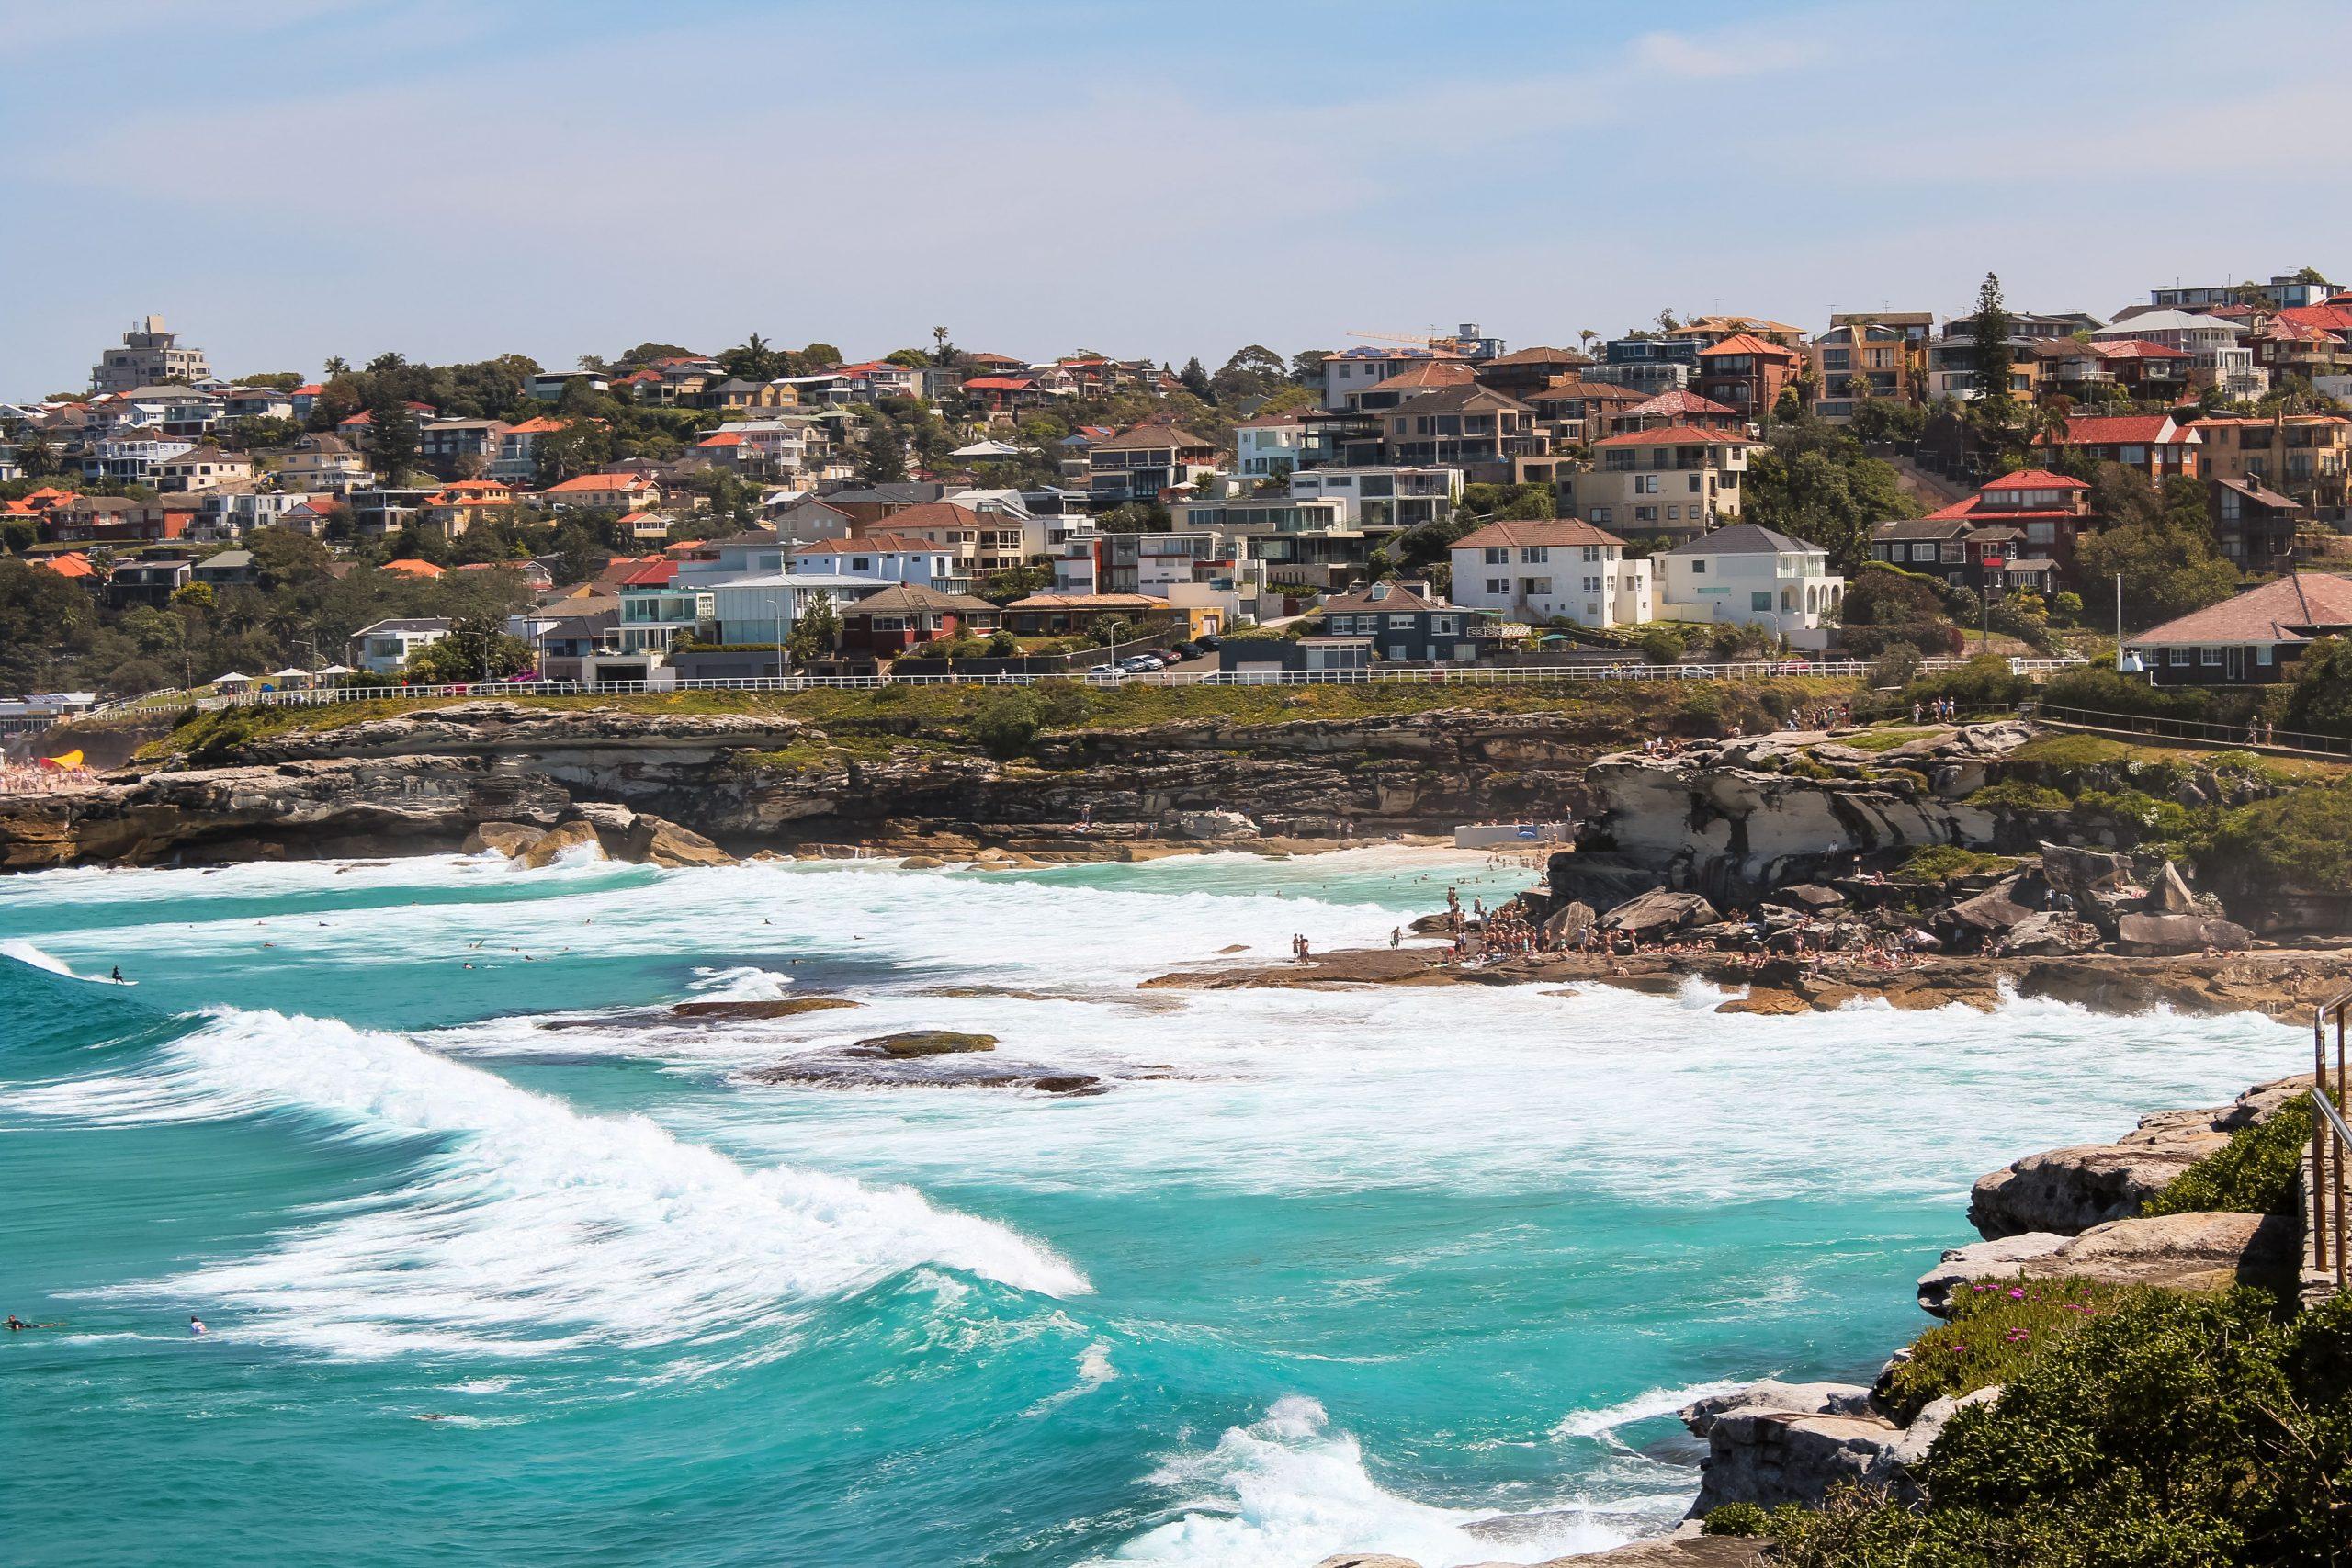 surf spots in Sydney